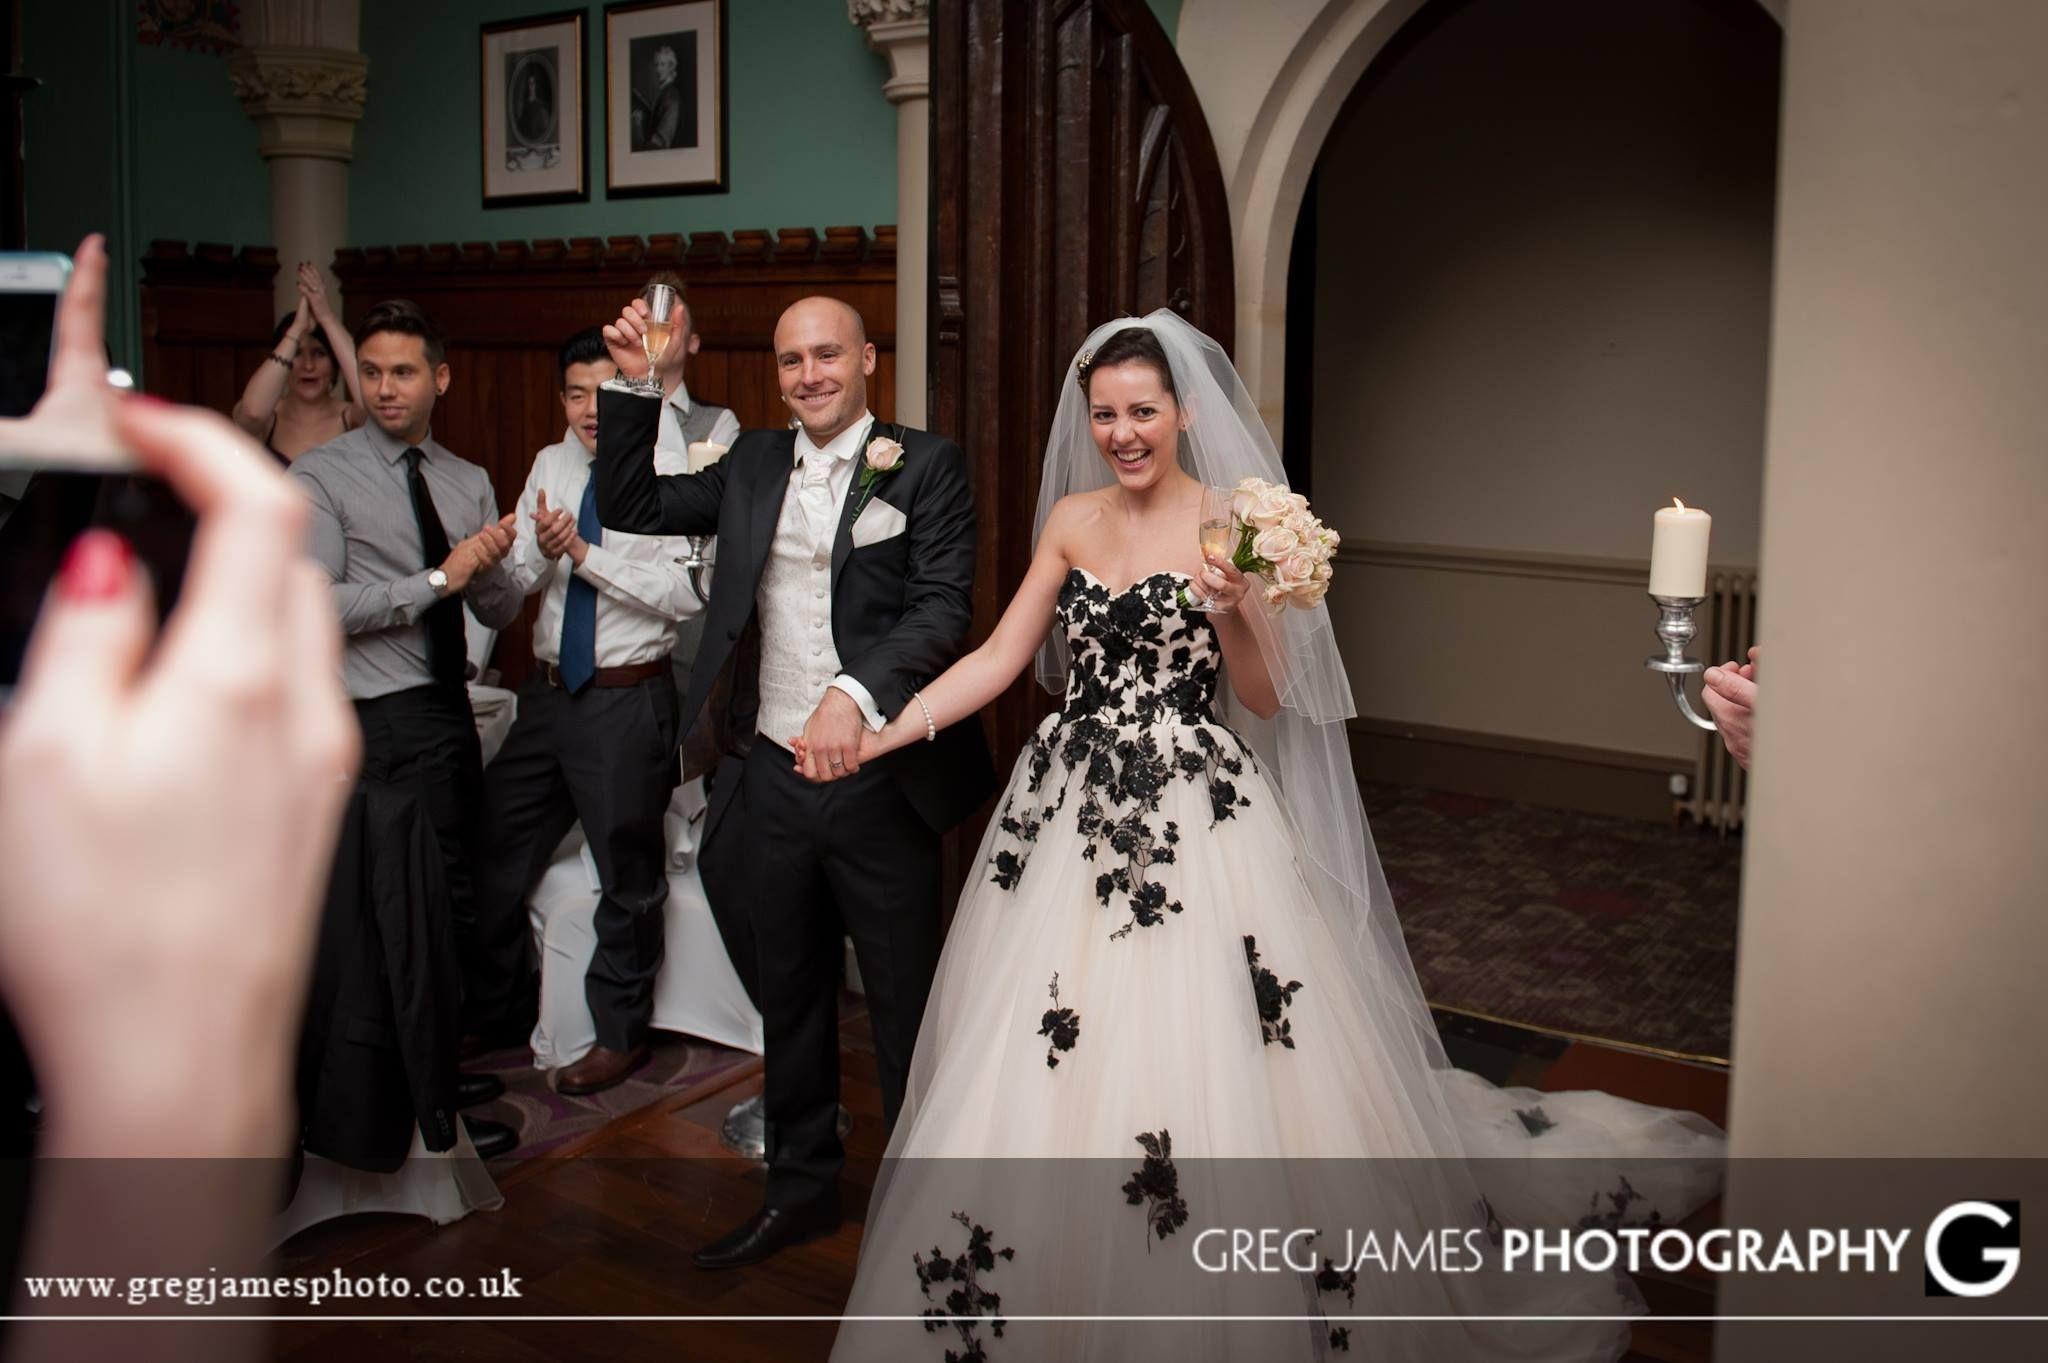 Purssey Wedding 07/12/13 #wedding #suit #suiting #groom #fashion #stylish  #reception #blacksuit #lounge #whitetie #weddingdress #cheers